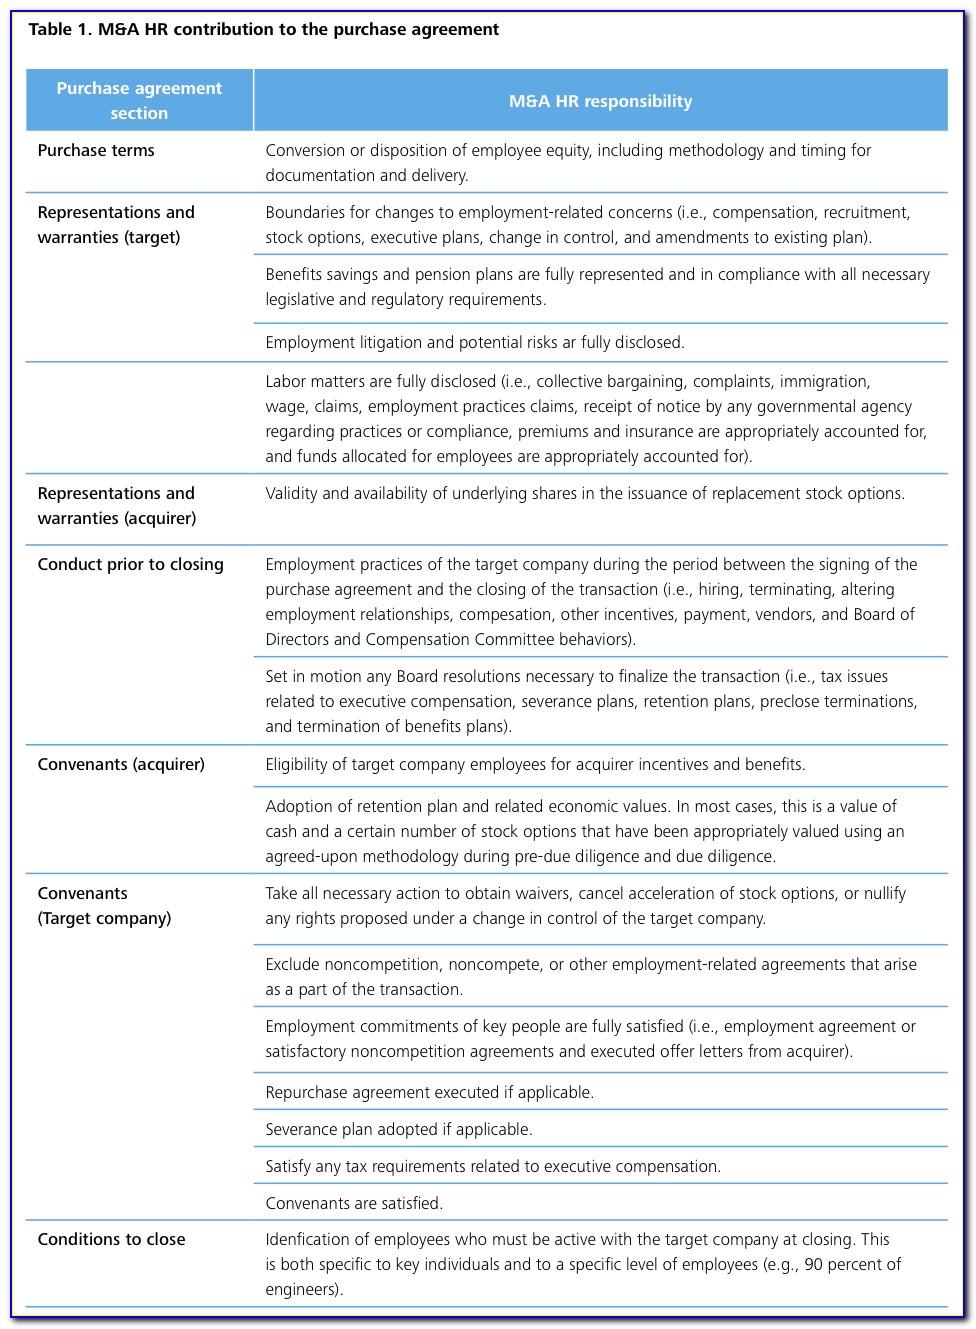 Financial Due Diligence Document Request List